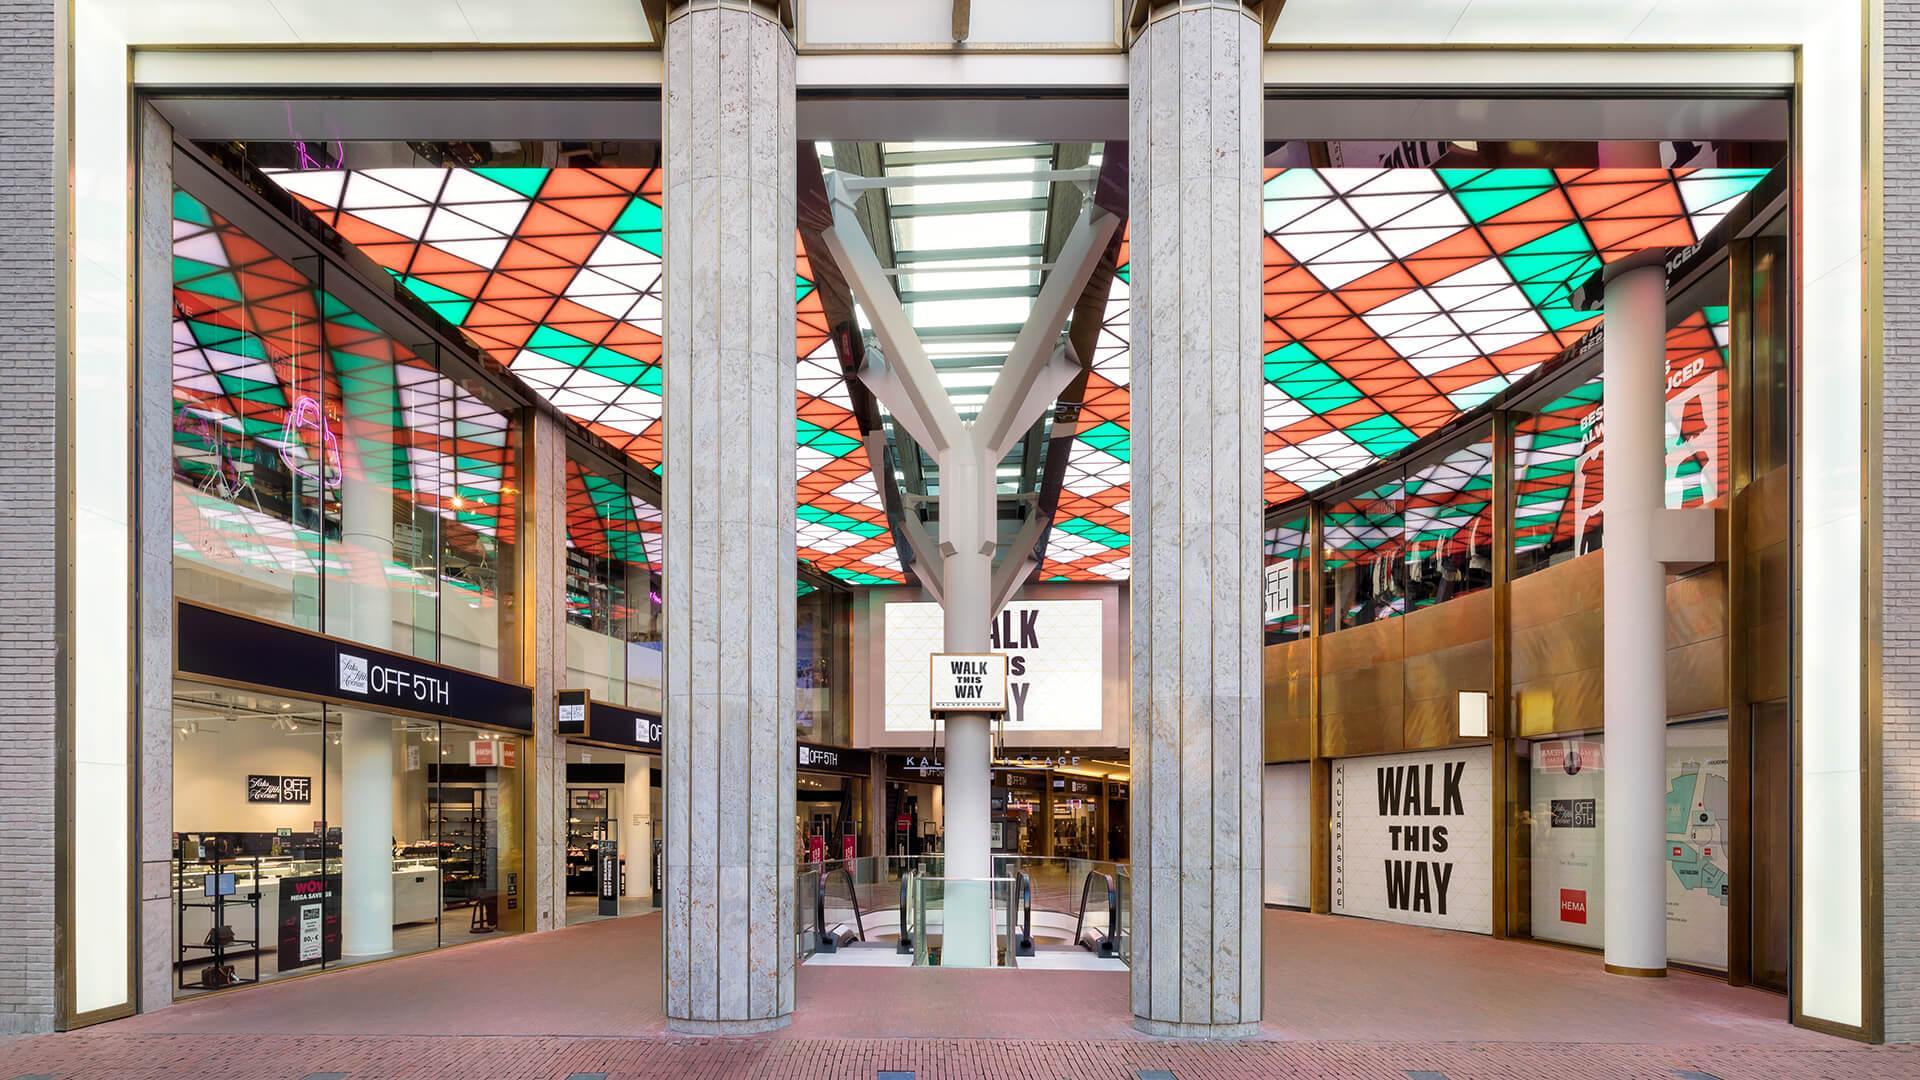 Arttenders Sigrid Calon Kalverpassage Storefront